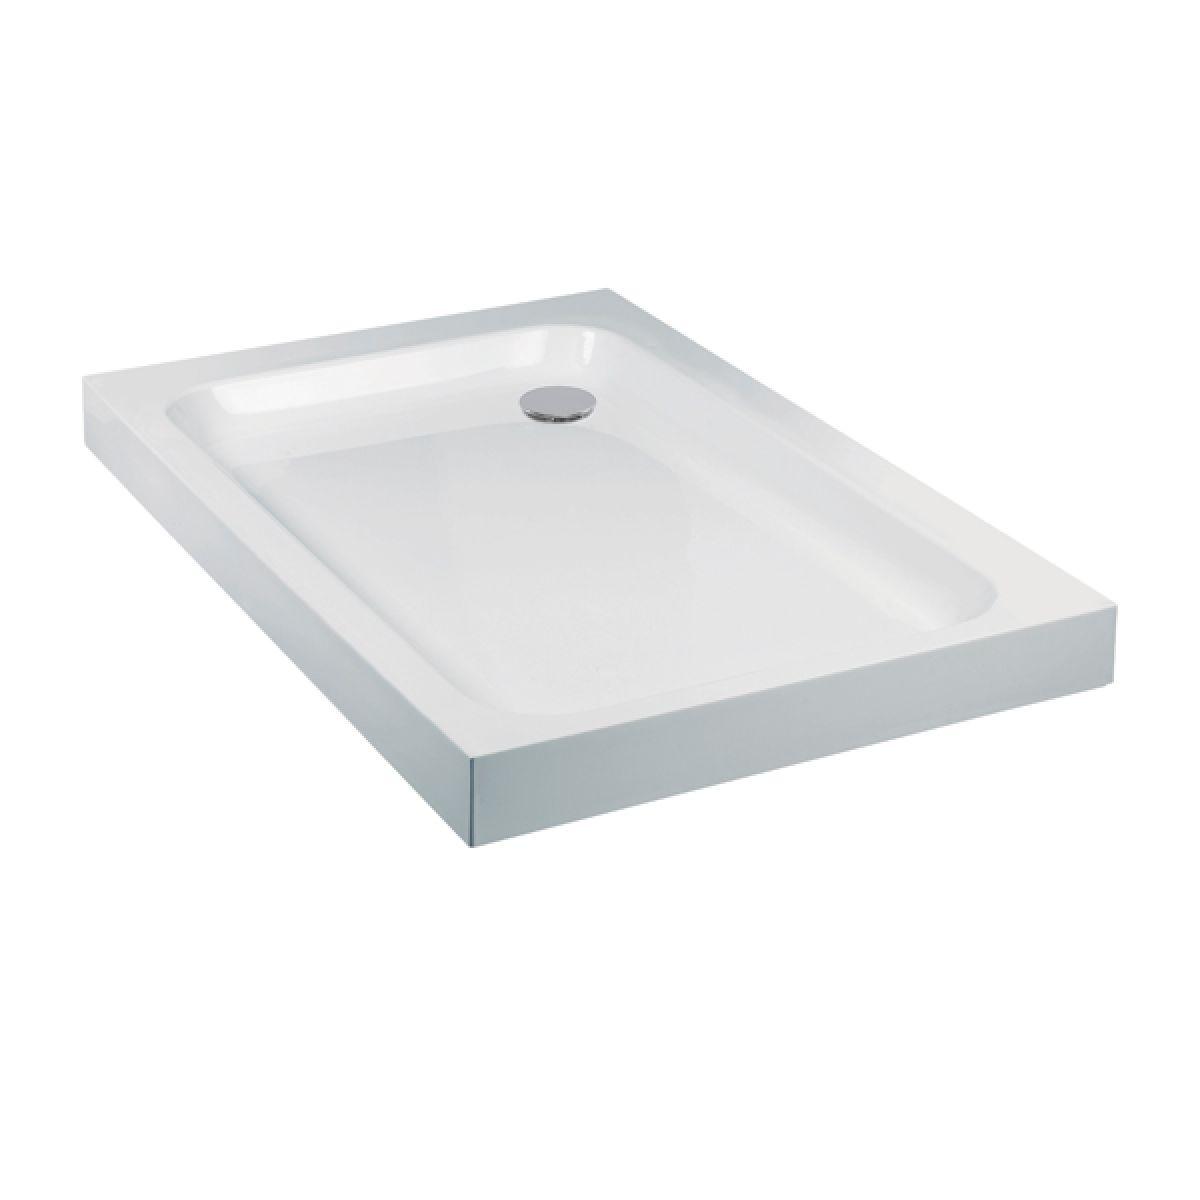 Frontline Standard Rectanglular Shower Tray 1200 x 760mm